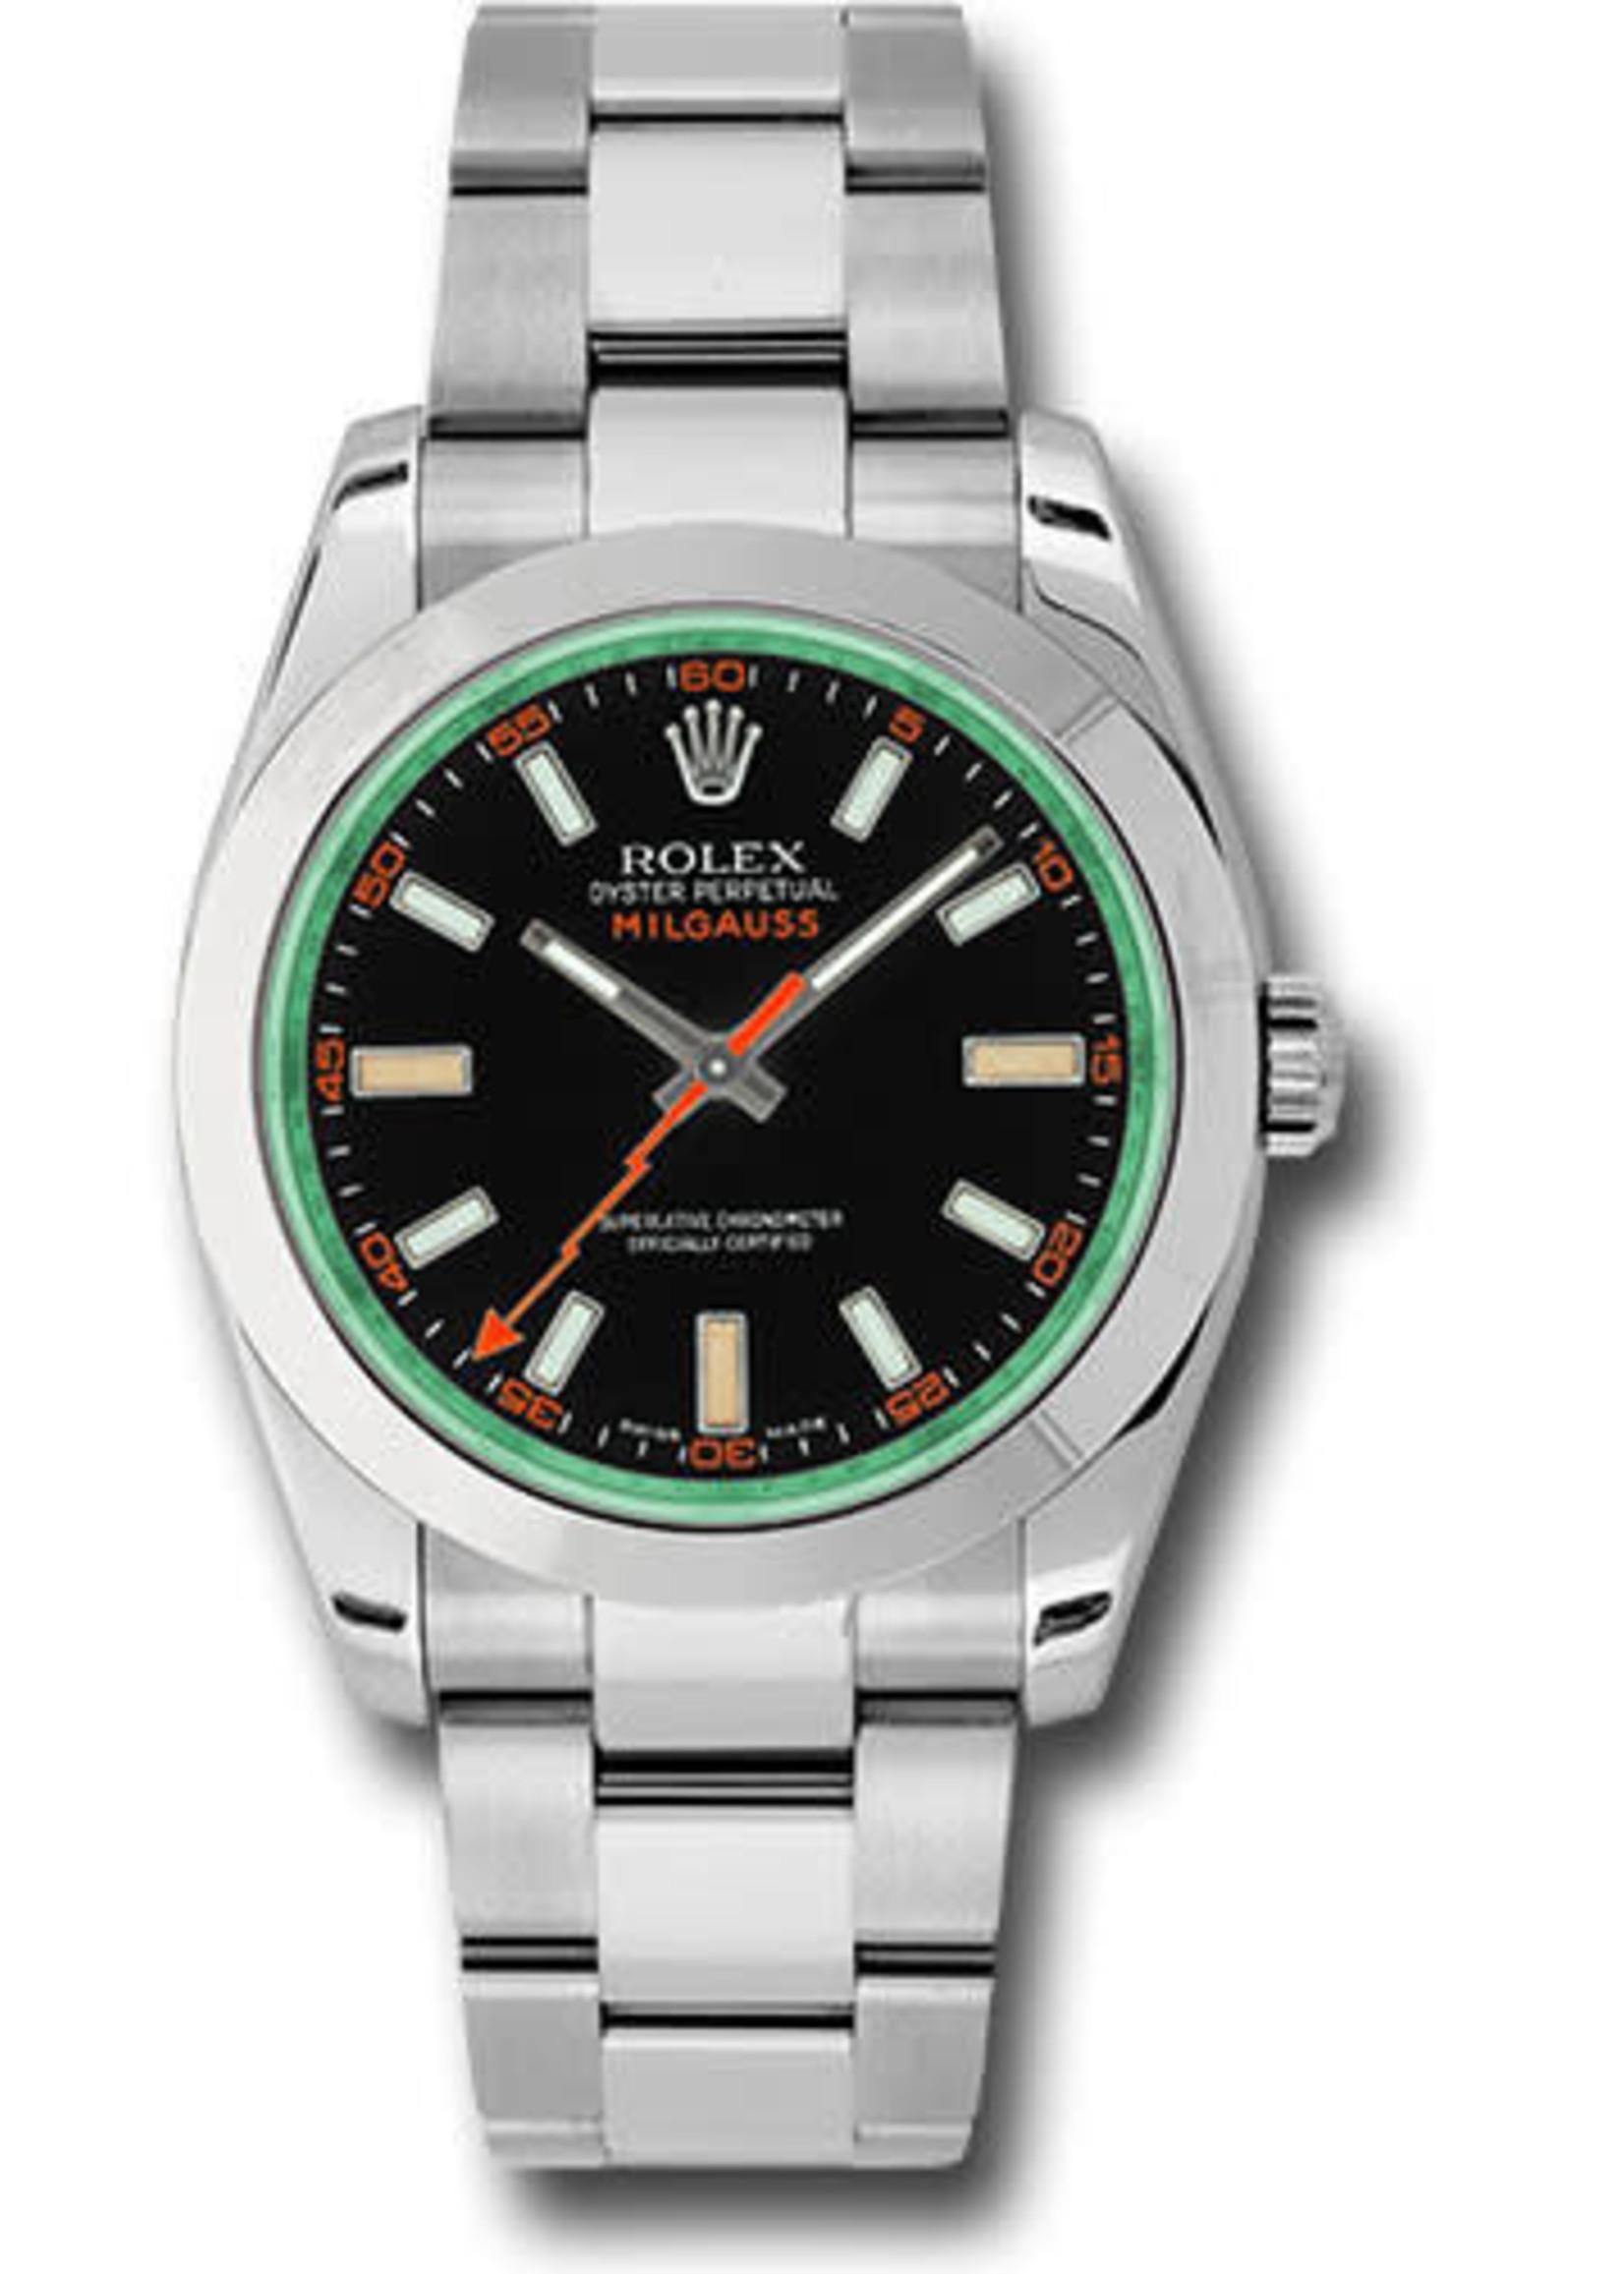 Rolex ROLEX MILGAUSS 40MM (2013 B+P) #116400GV